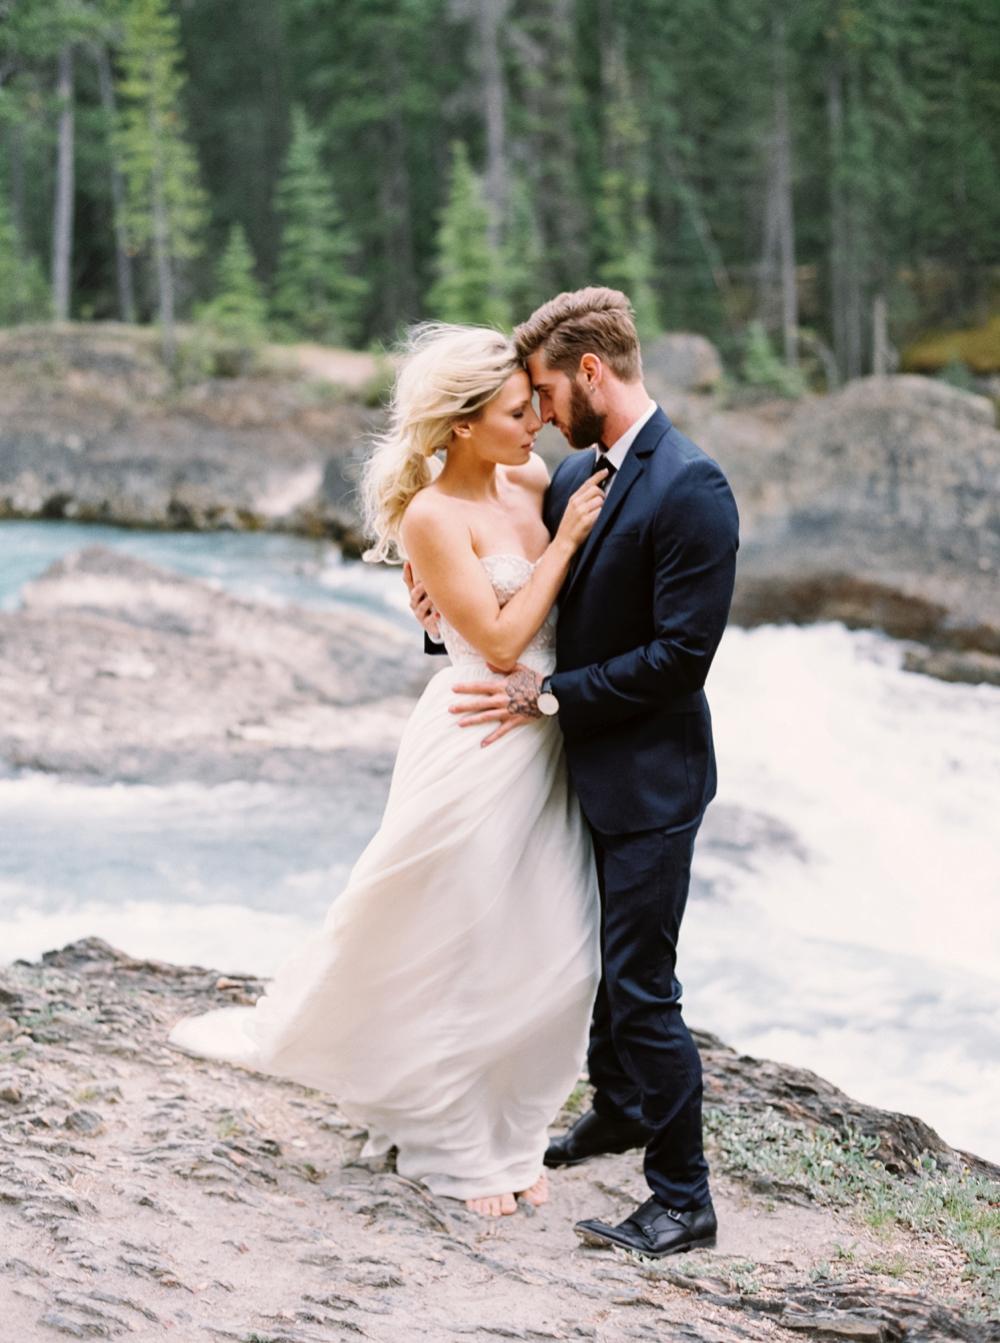 Calgary Wedding Photographers | Emerald Lake Lodge Wedding | Luminous The Workshop | Mountain Wedding